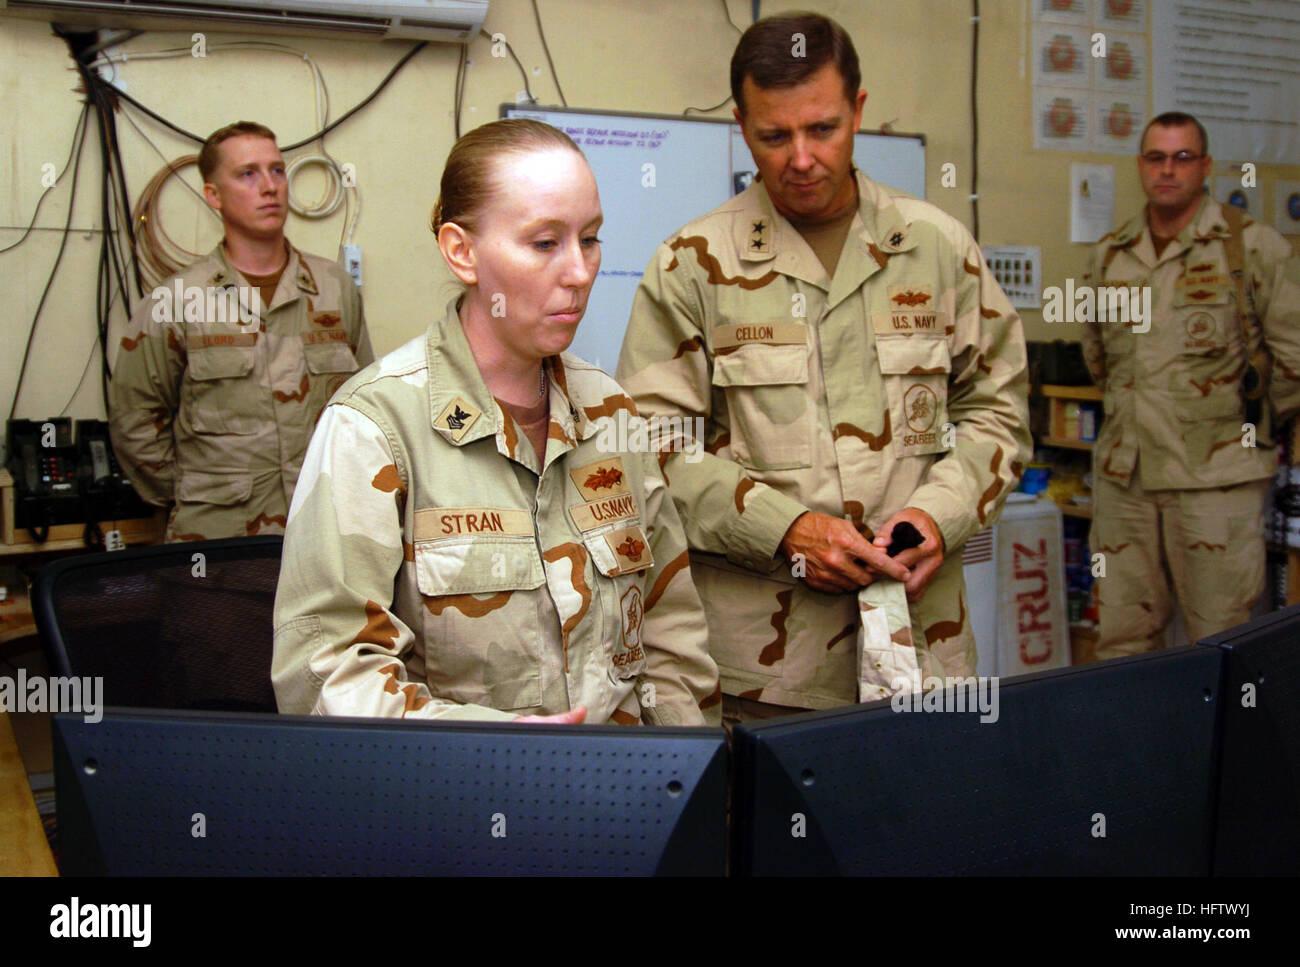 070806-N-8275M-106 CAMP FALLUJAH, Iraq (Aug. 6, 2007) - Rear Adm. Richard Cellon, commander 1st Naval Construction - Stock Image